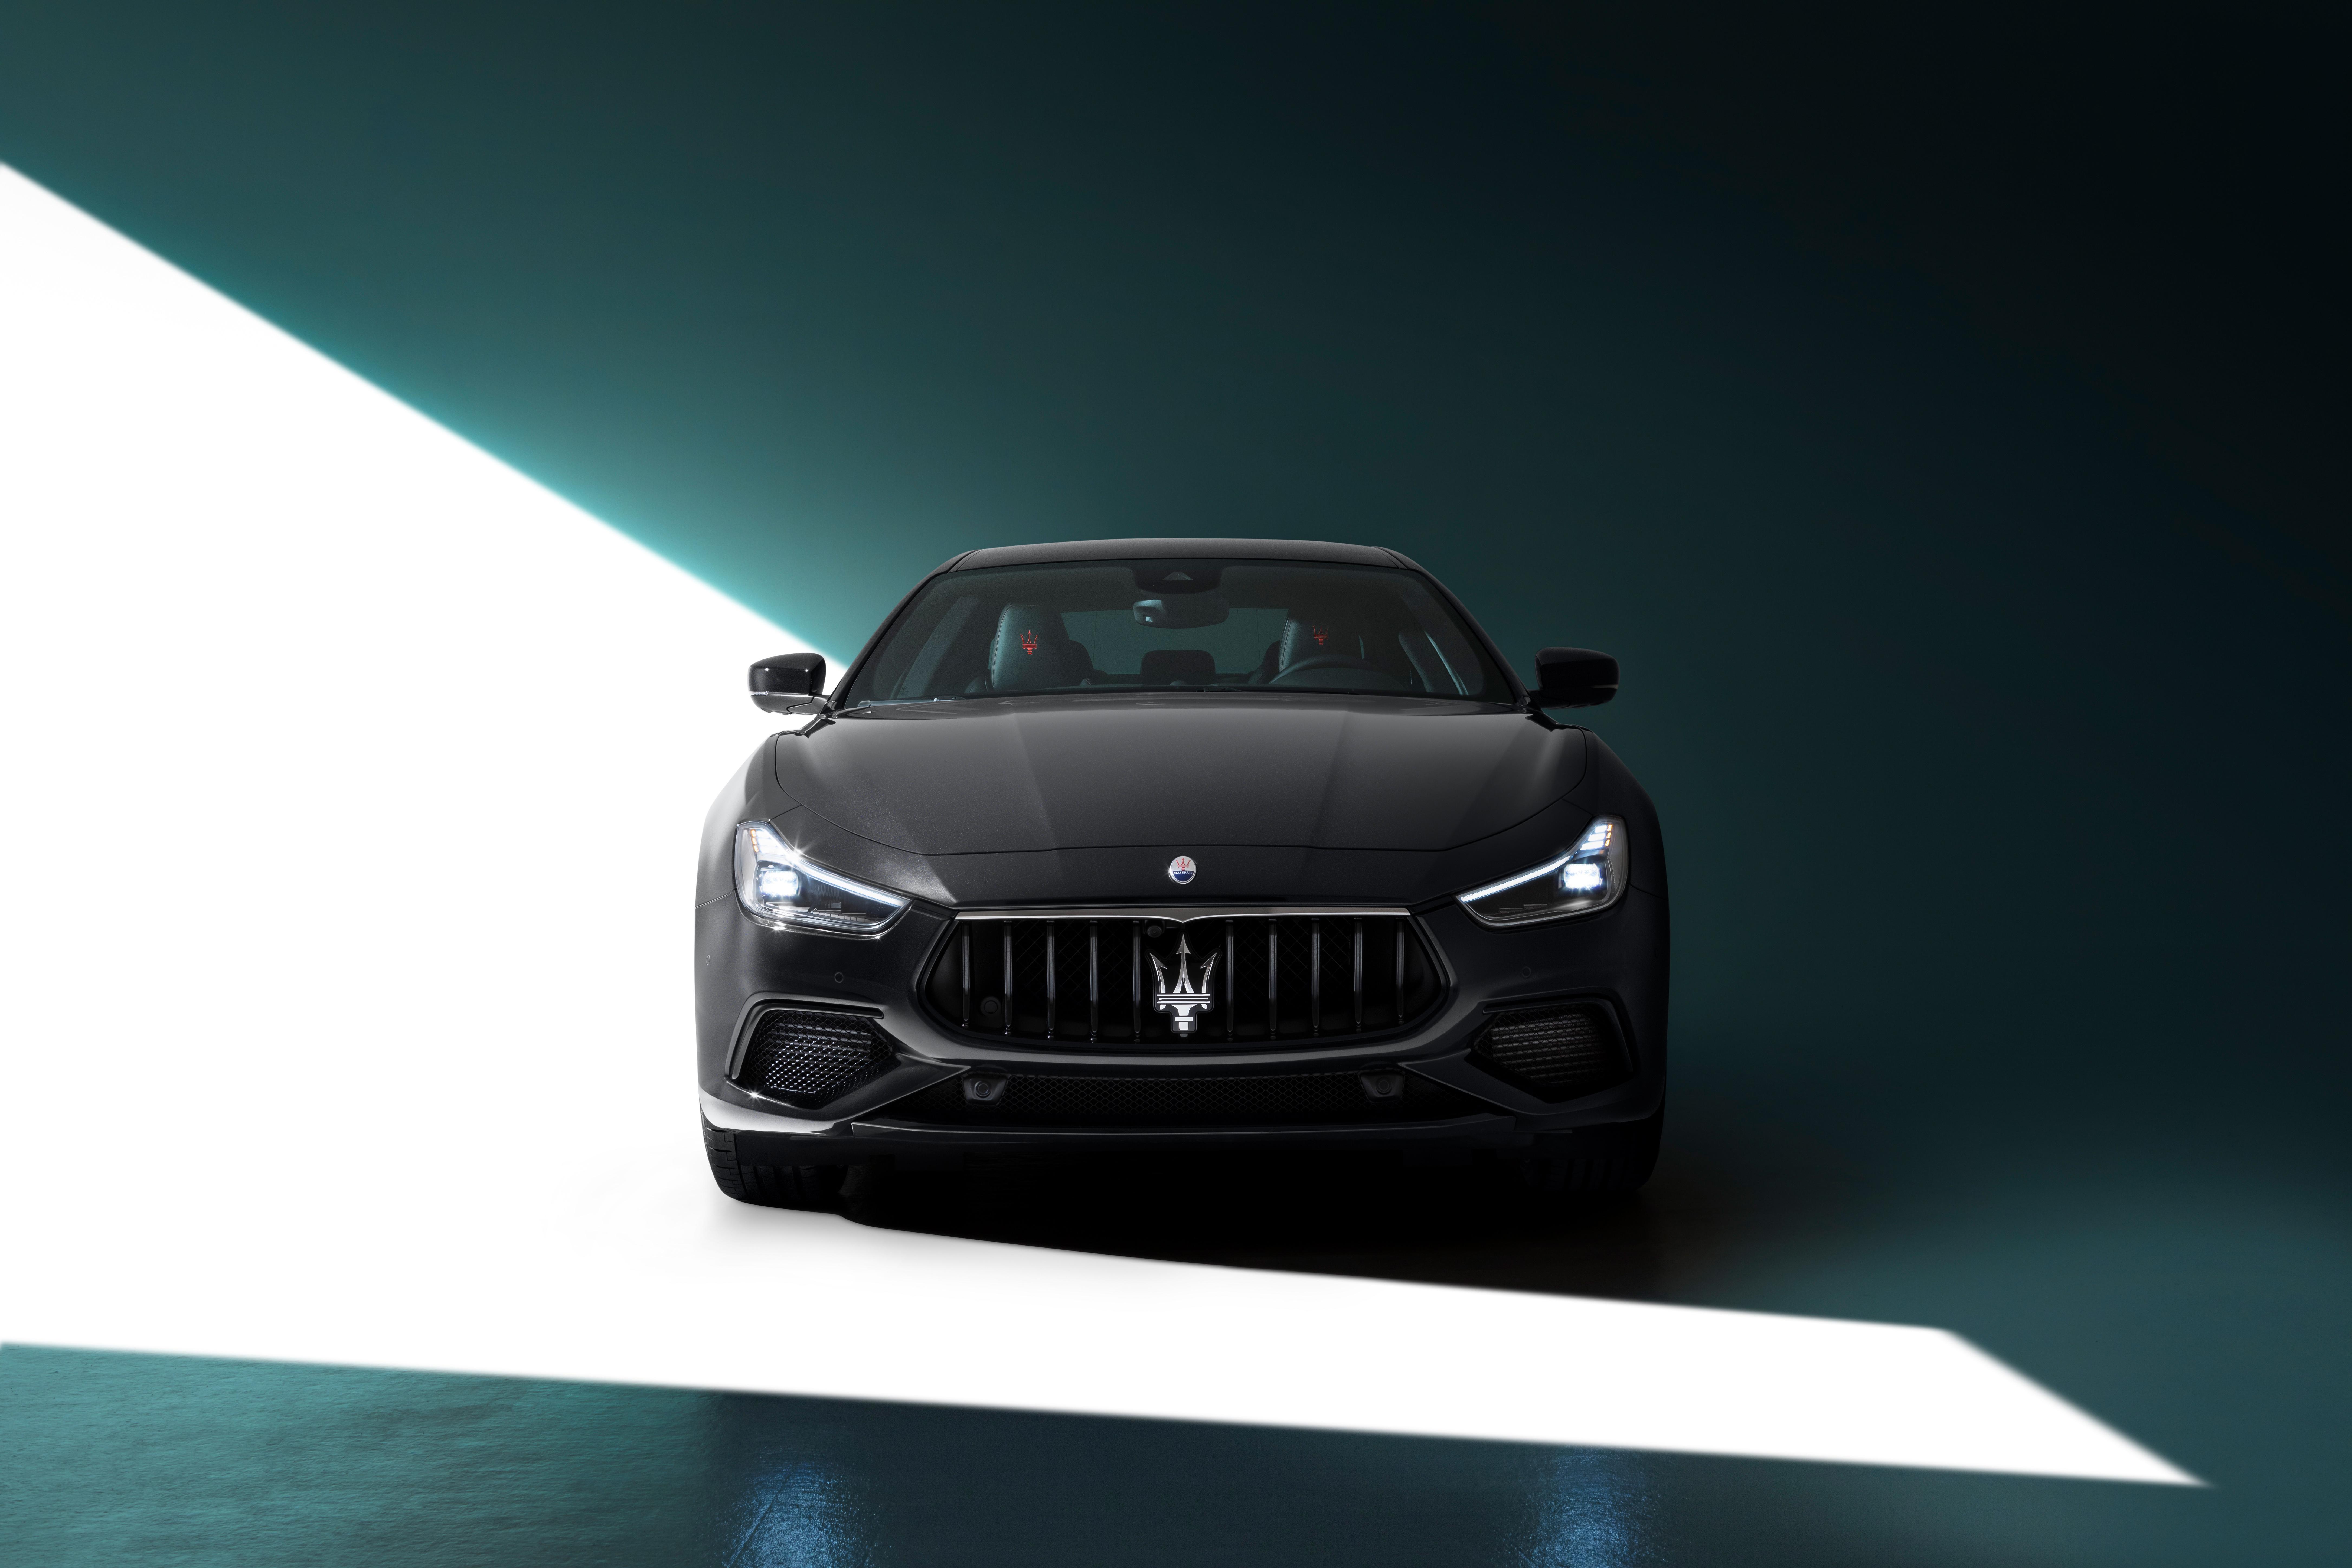 maserati ghibli s q4 gransport nerissimo pack 2021 4k 1608980015 - Maserati Ghibli S Q4 GranSport Nerissimo Pack 2021 4k - Maserati Ghibli S Q4 GranSport Nerissimo Pack 2021 4k wallpapers